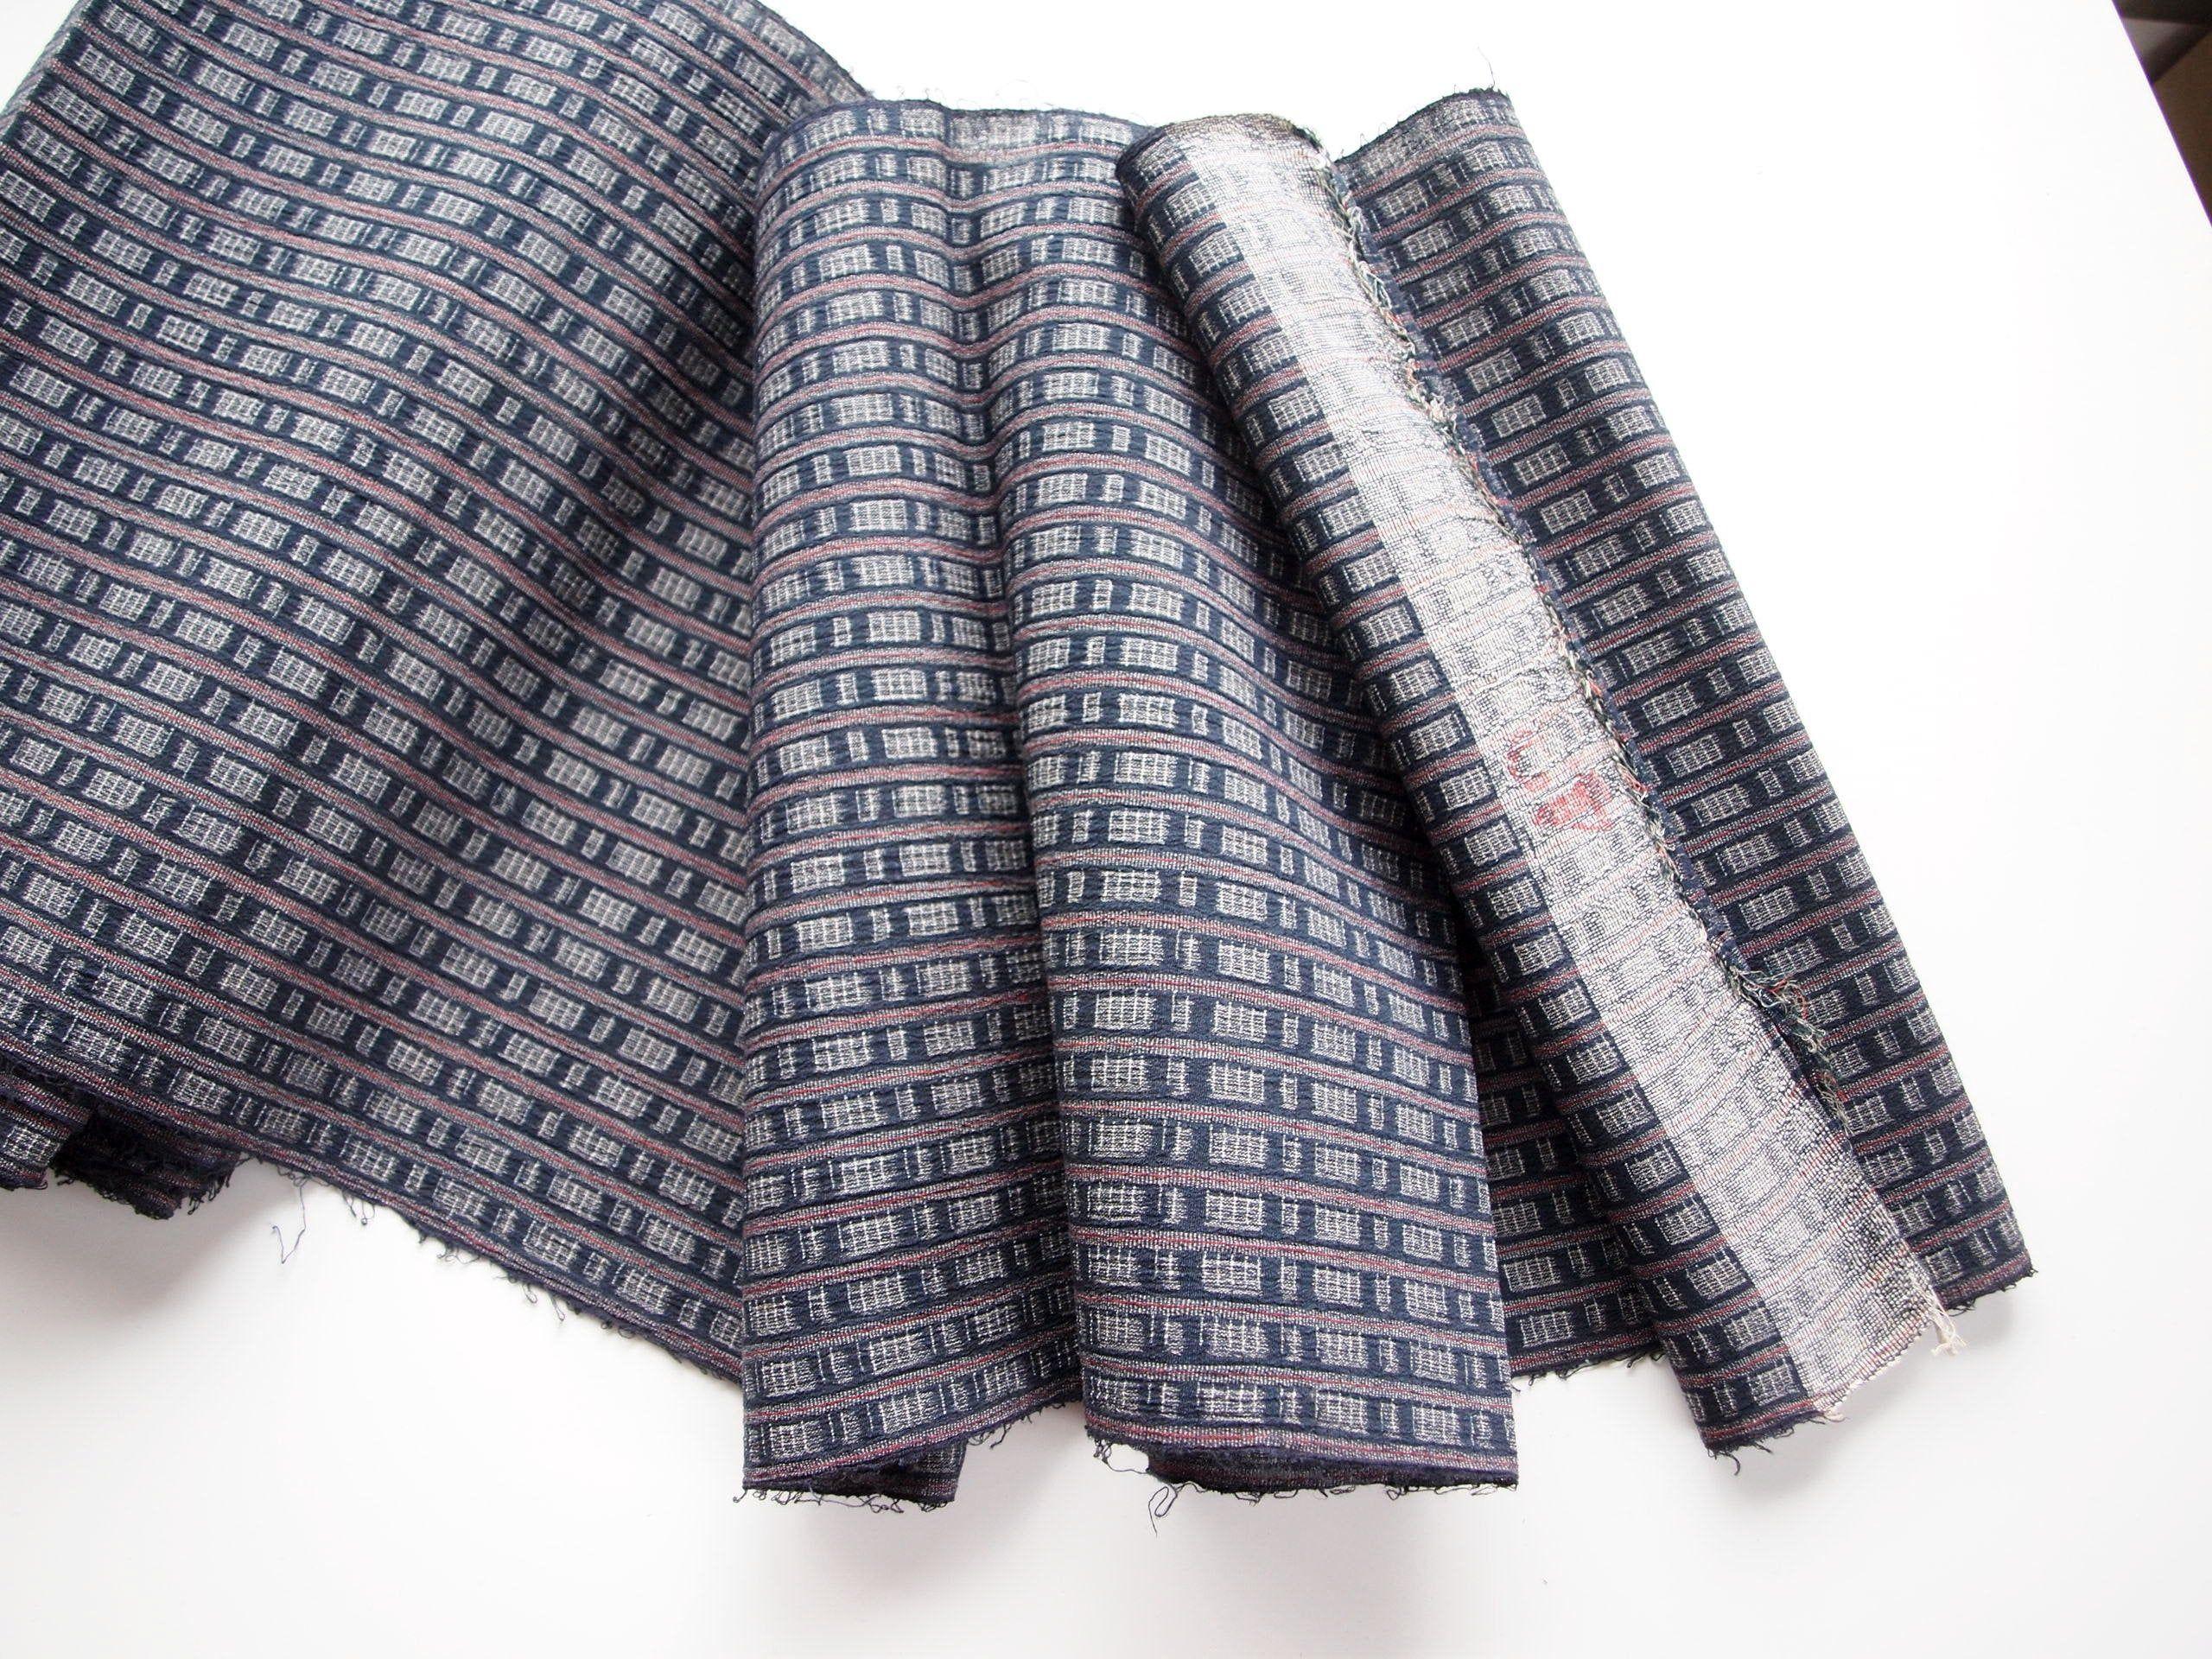 Summer Kimono Silk Kimono Fabric Fabric By The Yard Etsy Kimono Fabric Summer Kimono Silk Kimono